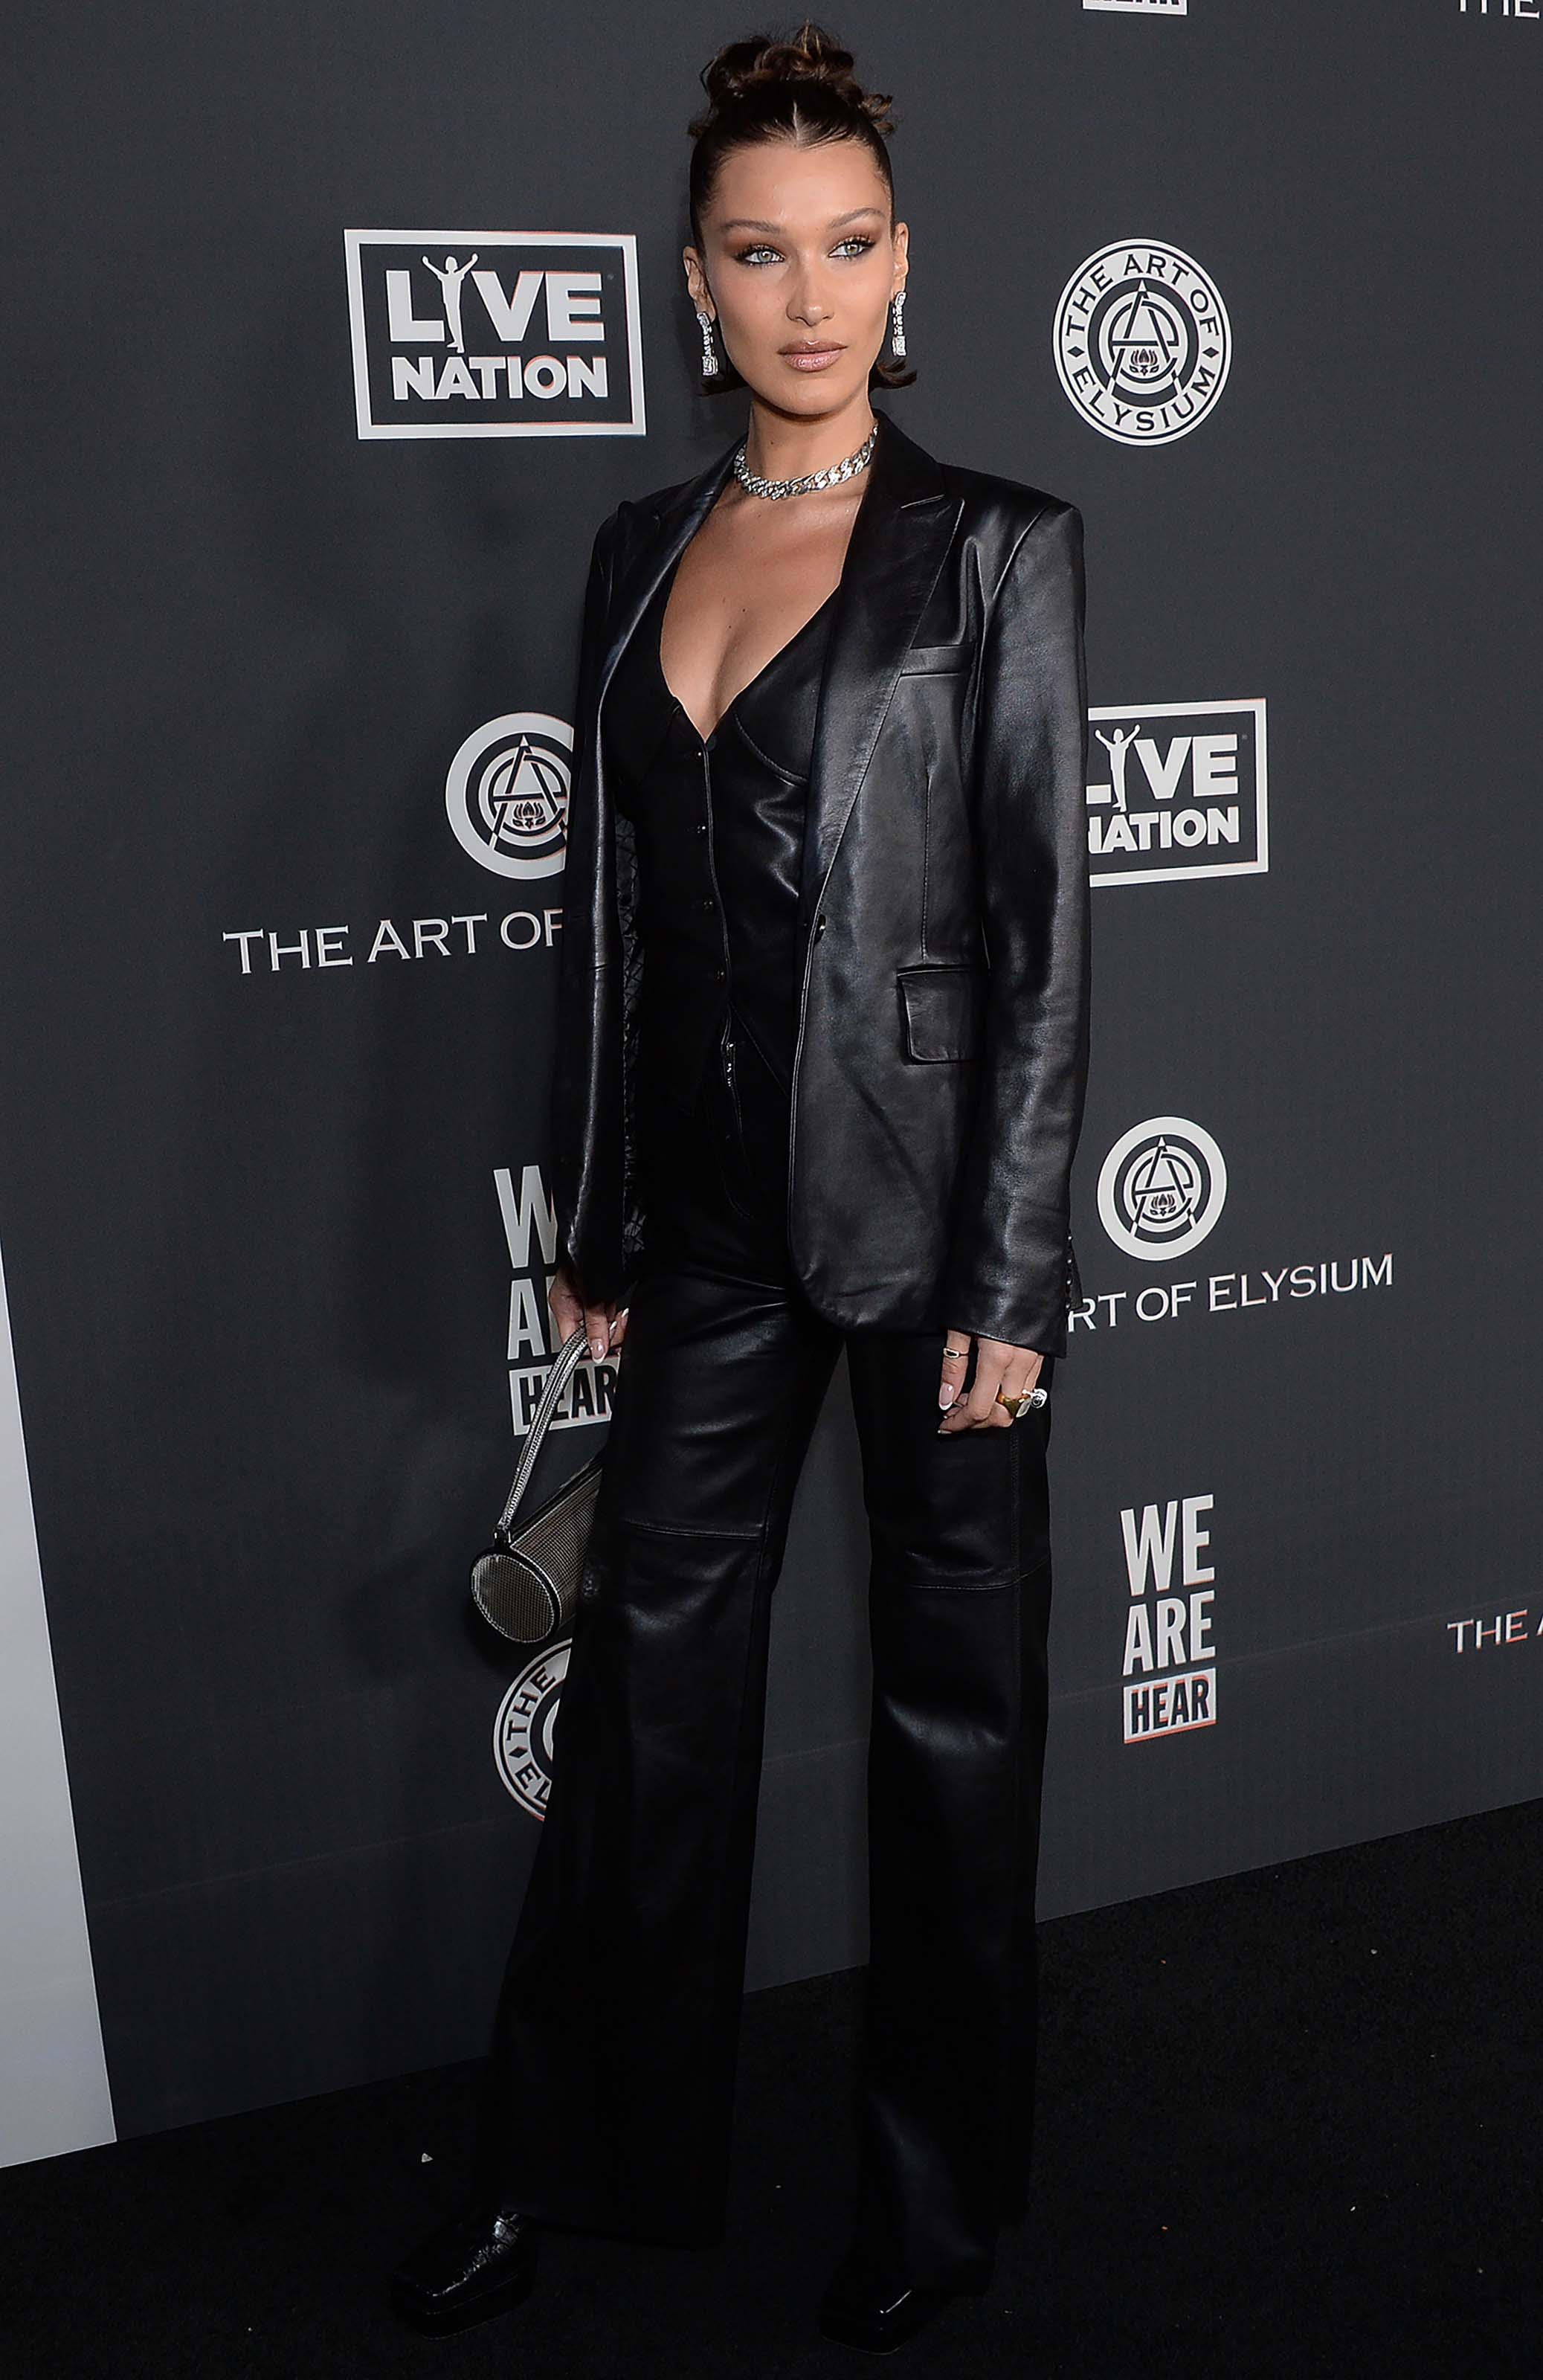 Bella Hadid attends The Art of Elysium